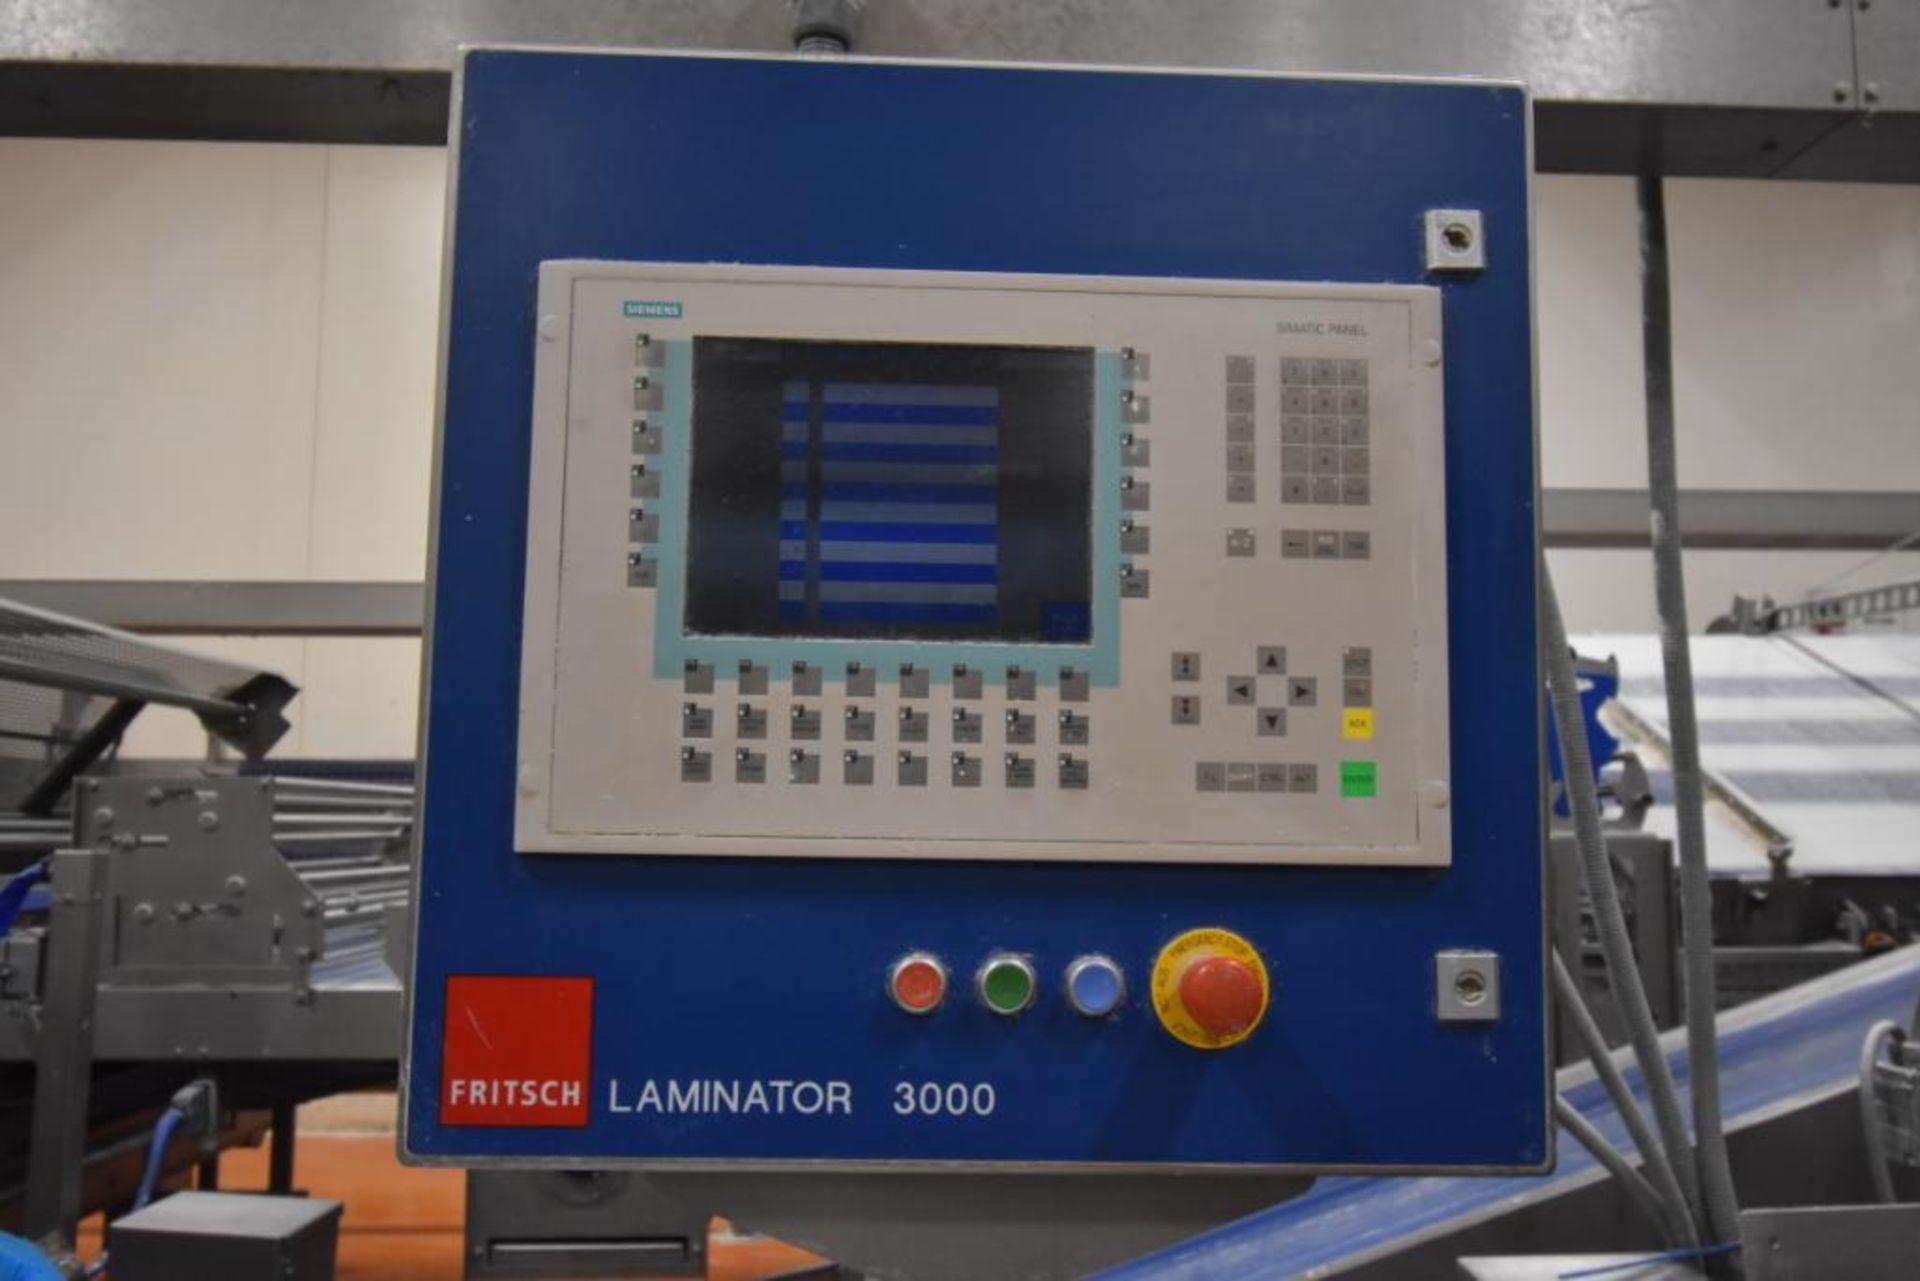 2007 Fritsch Laminator 3000 dough line - Image 86 of 280